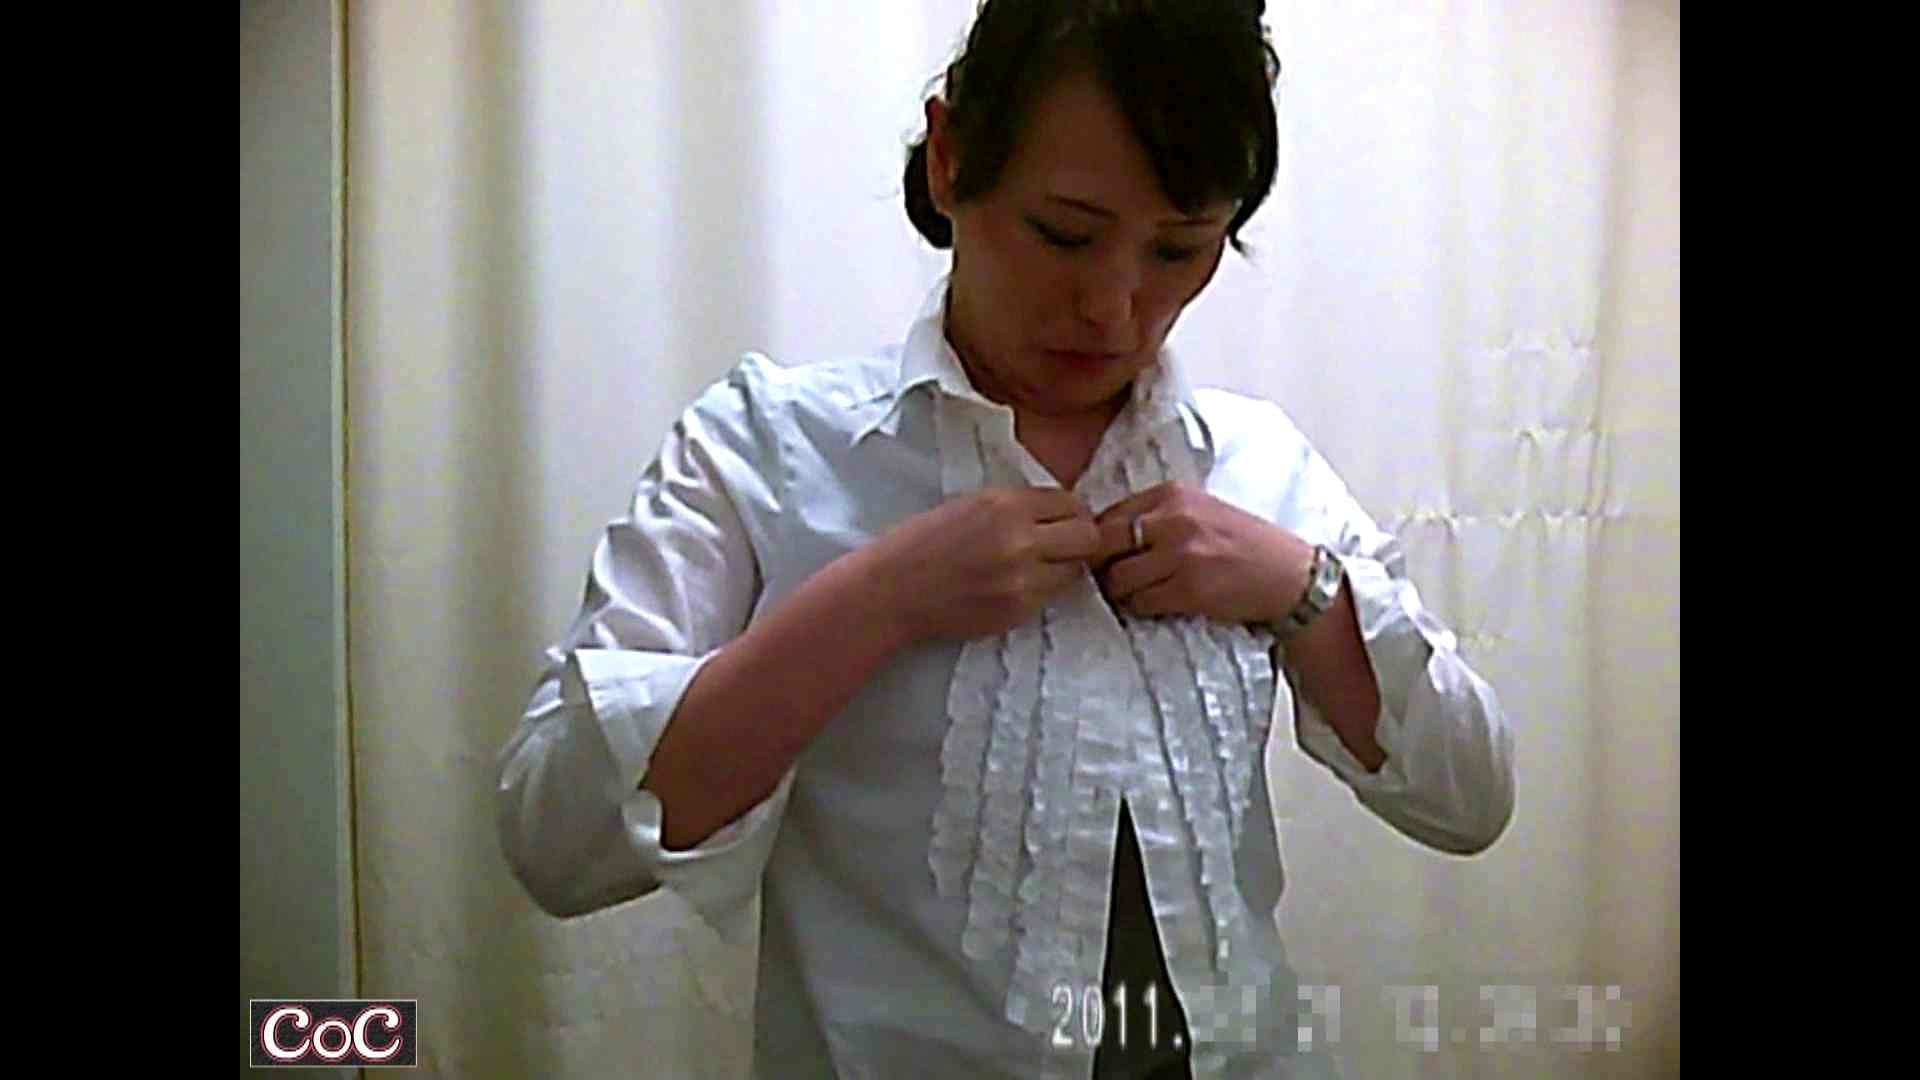 Doctor-X元医者による反抗vol.67 OL  53pic 8